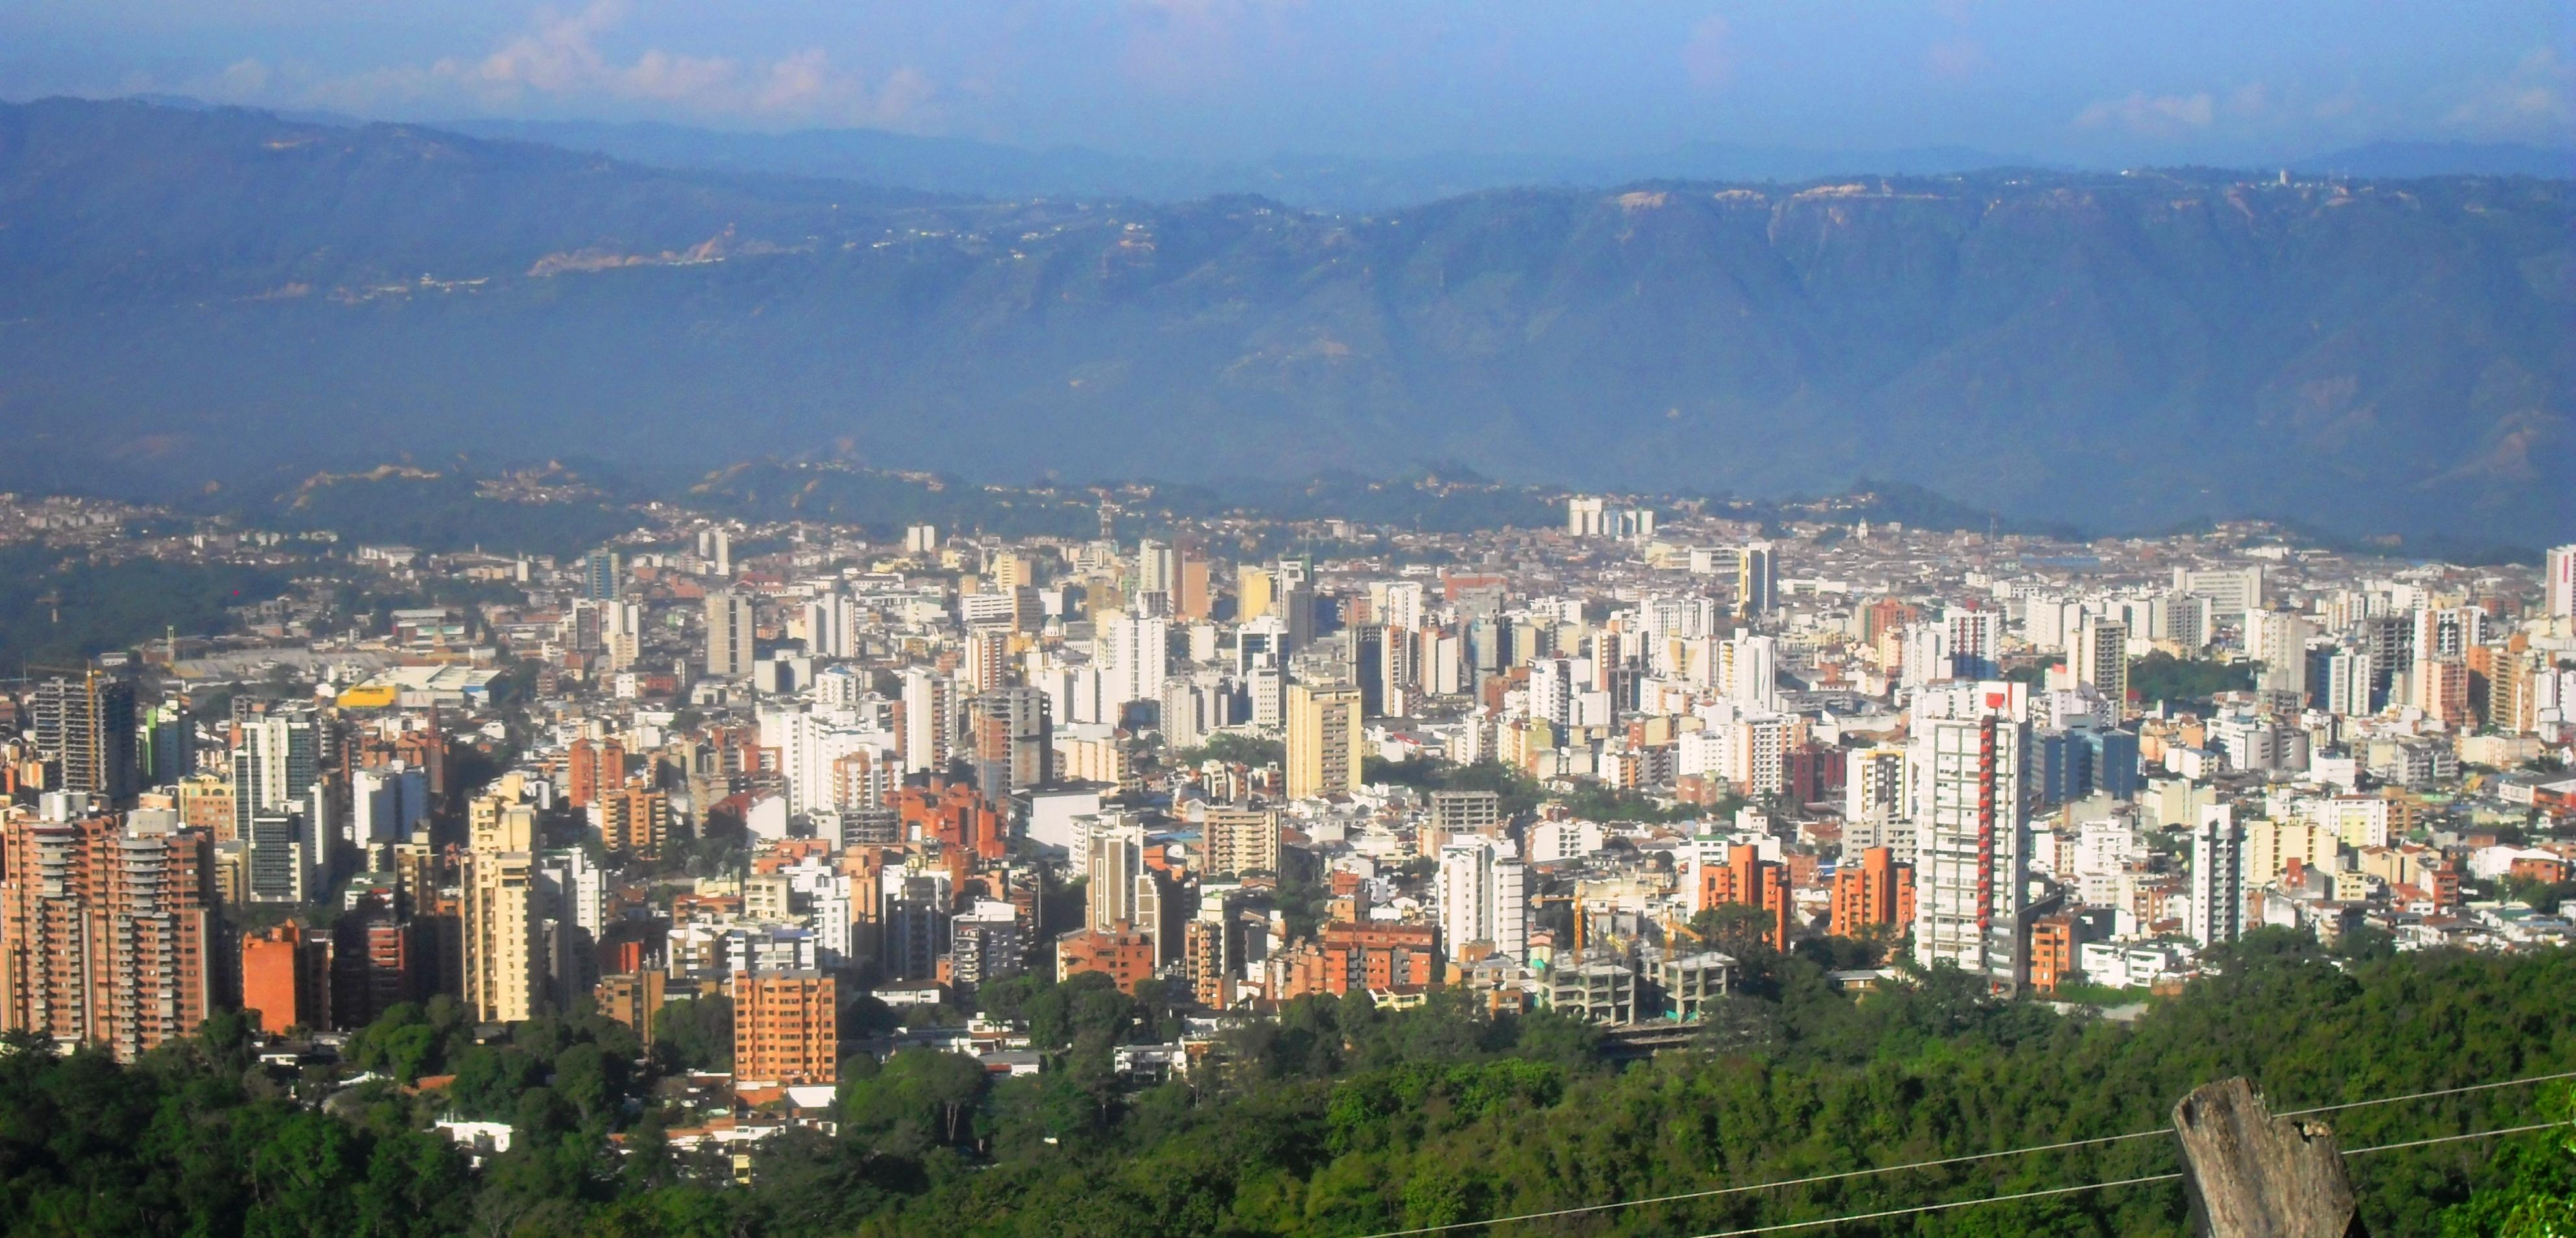 File:Bucaramanga v cu.JPG - Wikimedia Commons